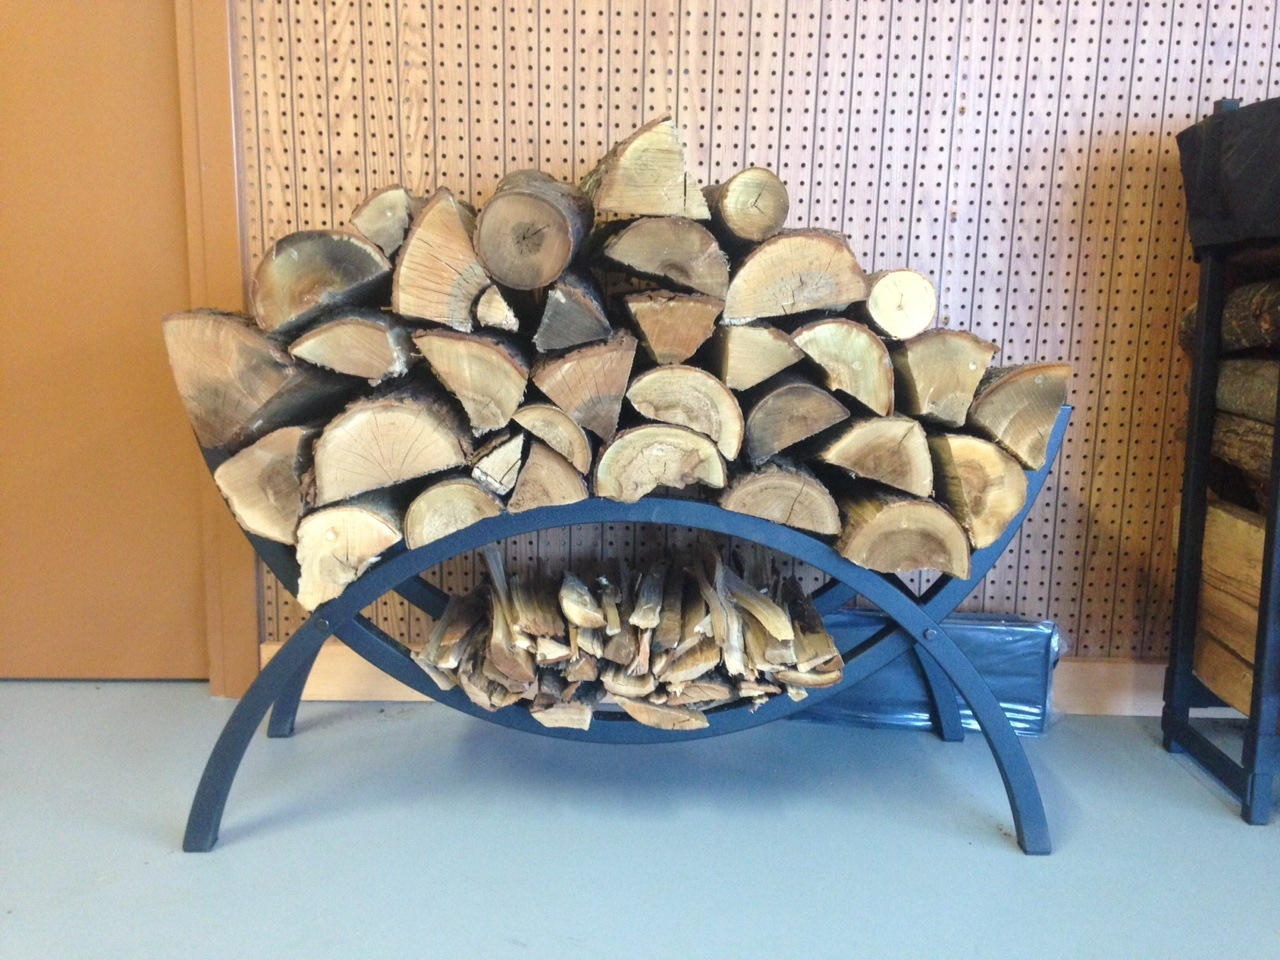 Firewood Racks For Sale Amp Firewood Racks For Storage In Wi